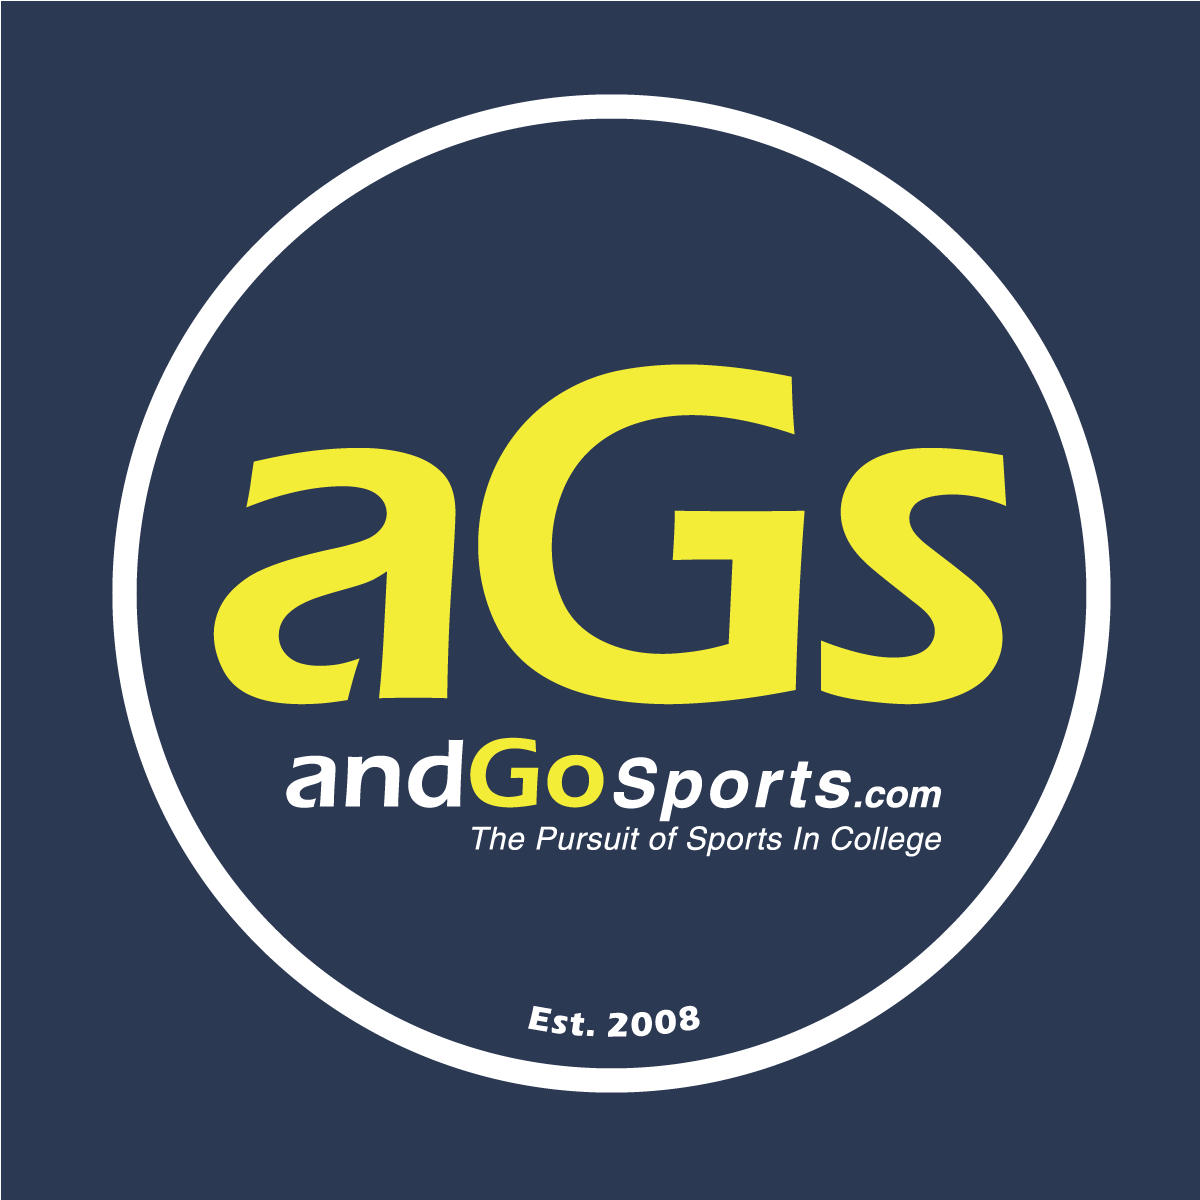 andGoSports